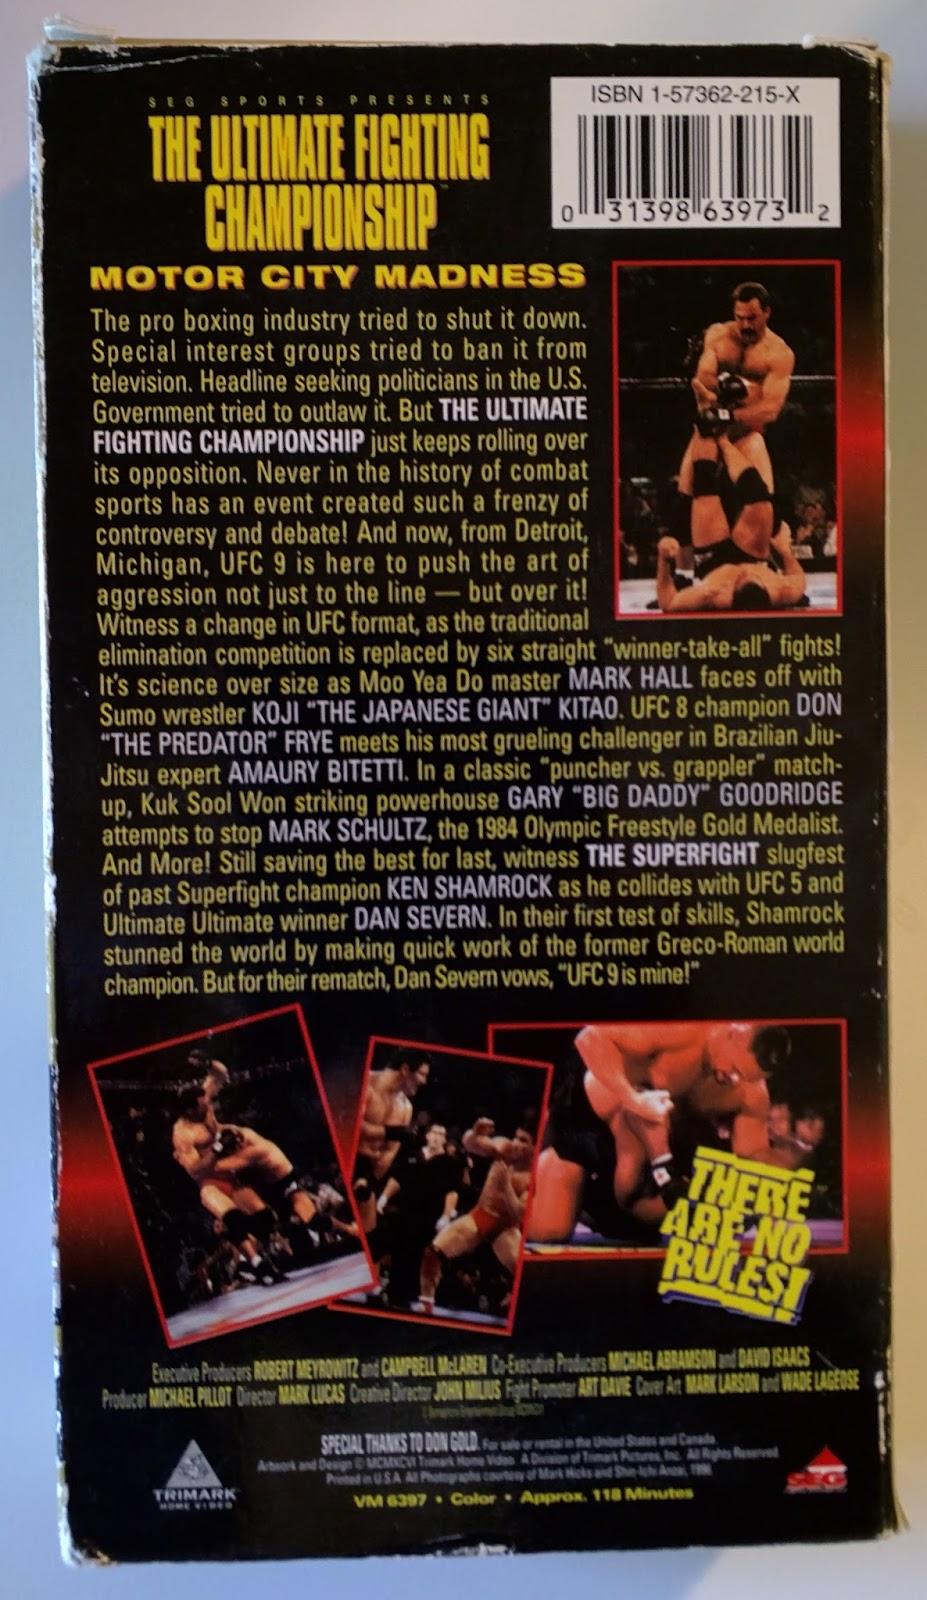 UFC 9: Motor City Madness VHS ...